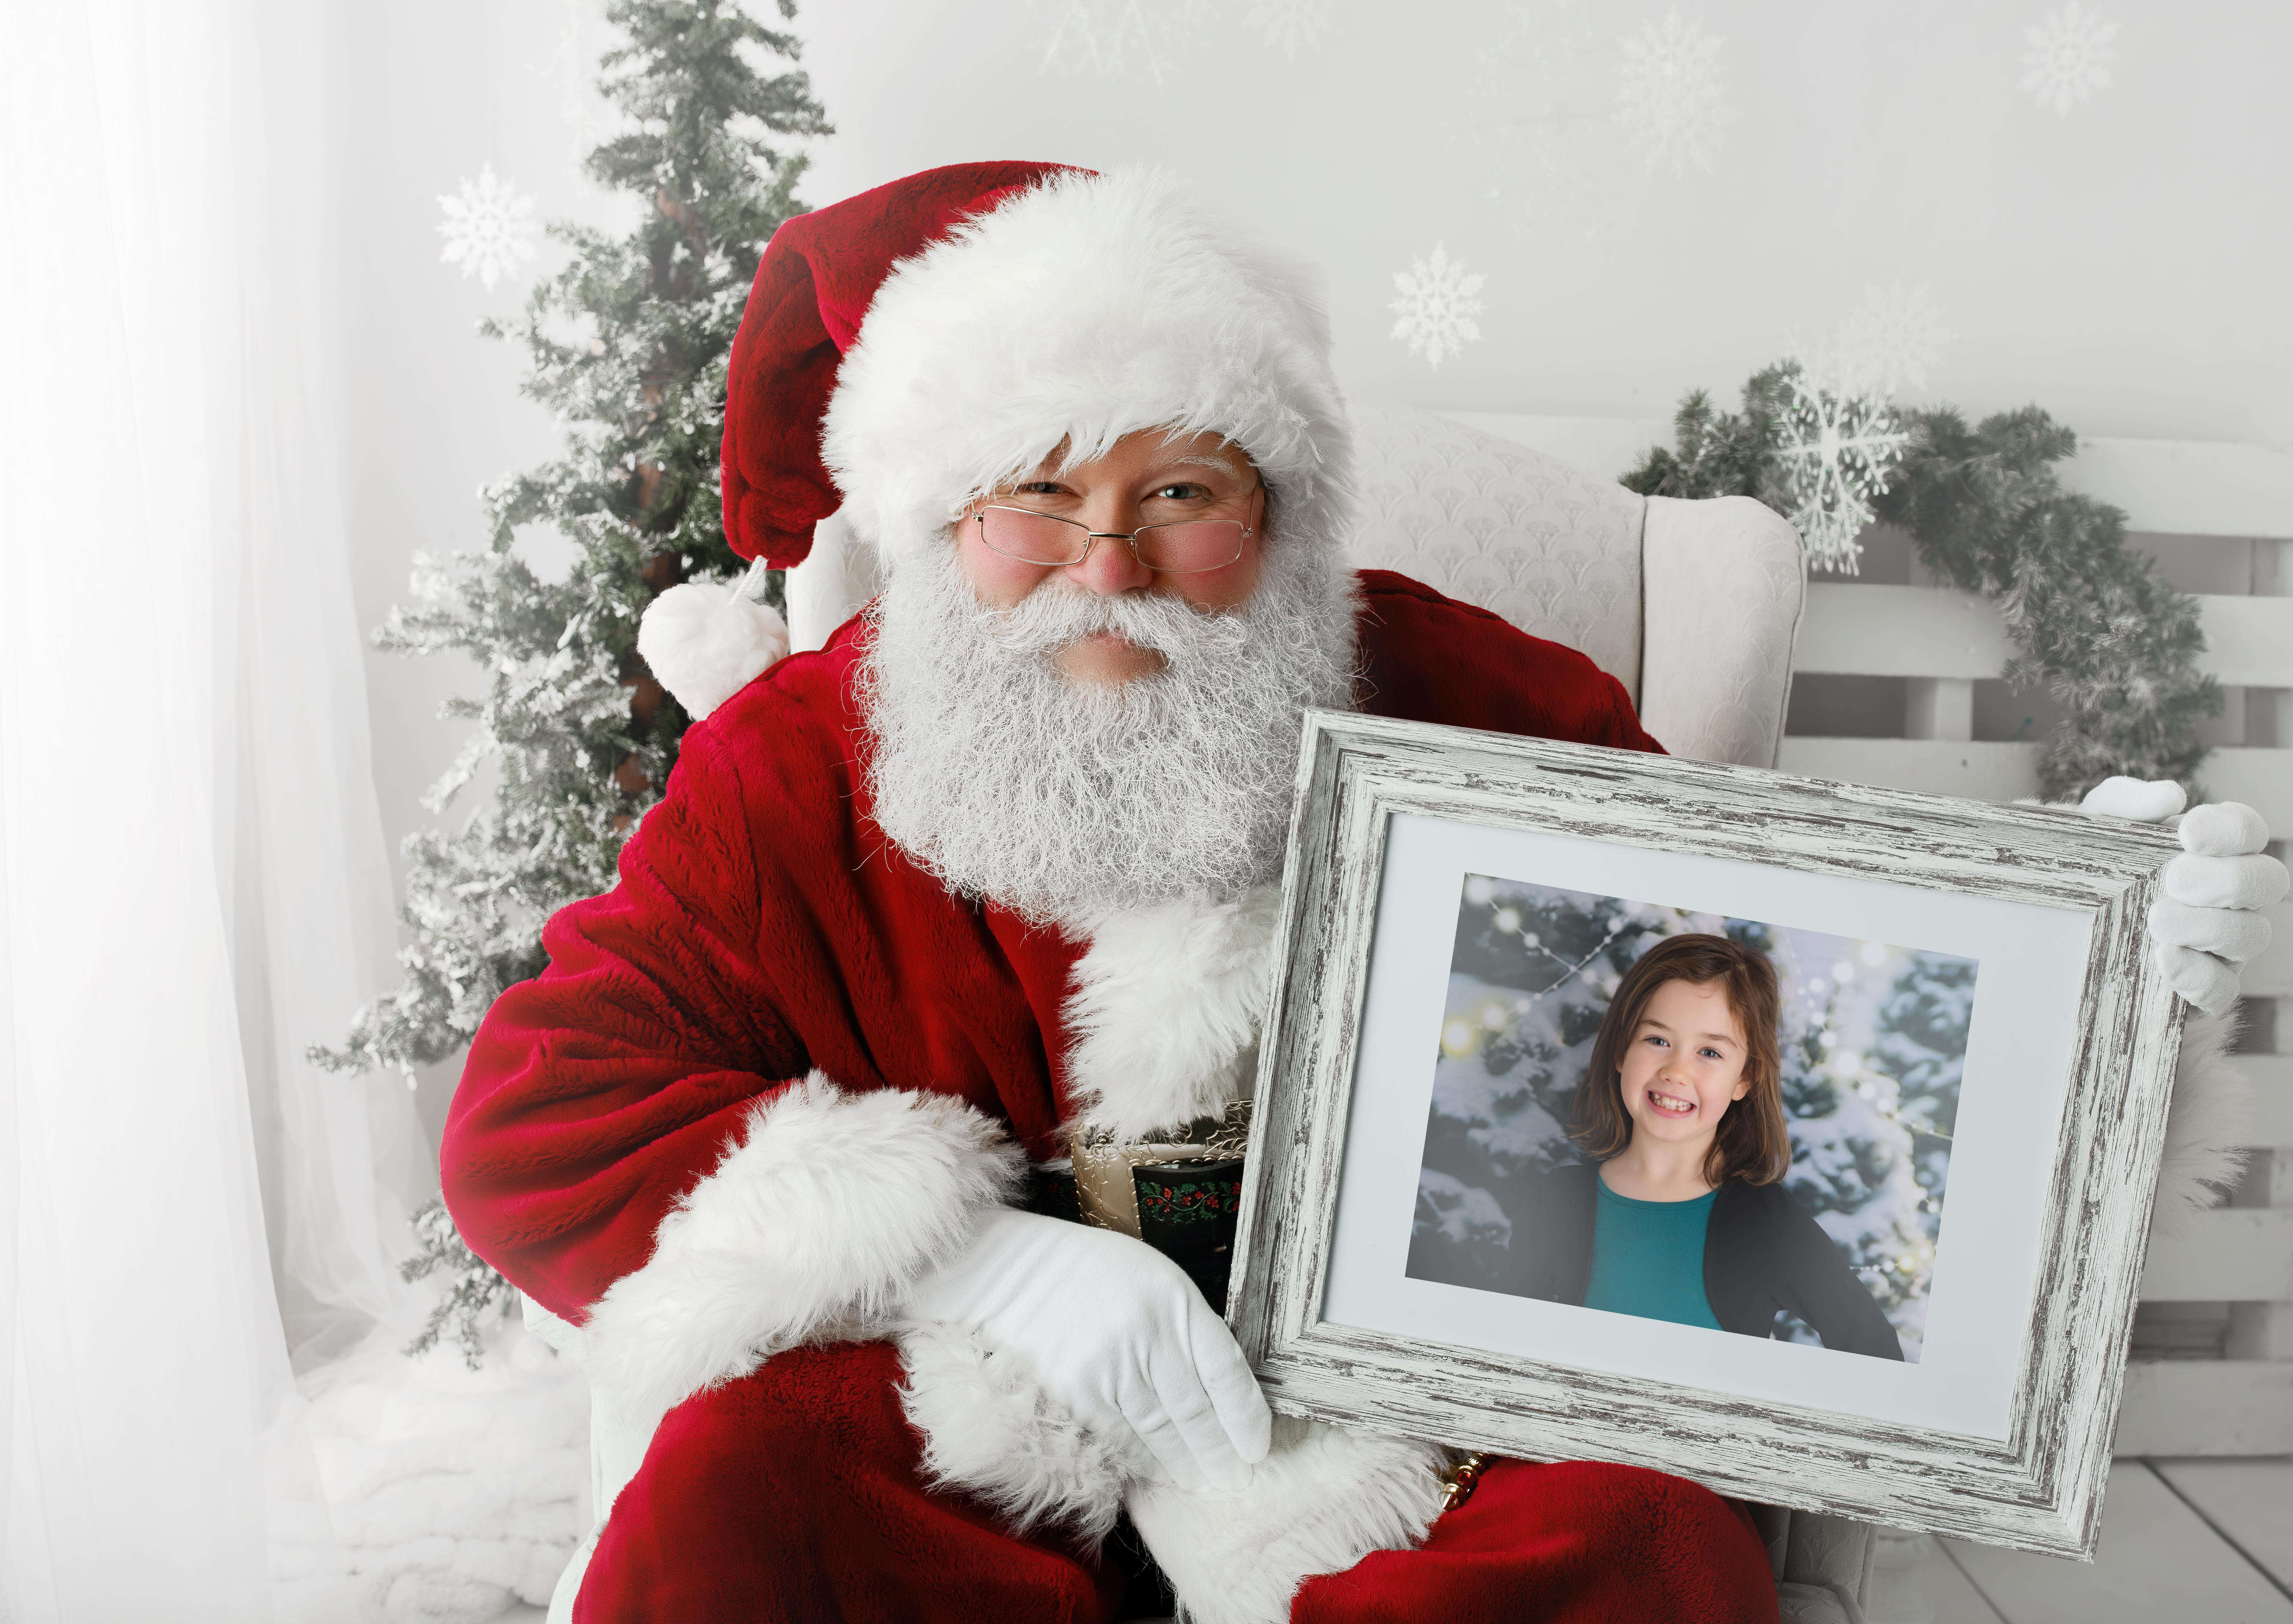 #9 - Santa with Portrait - Haze